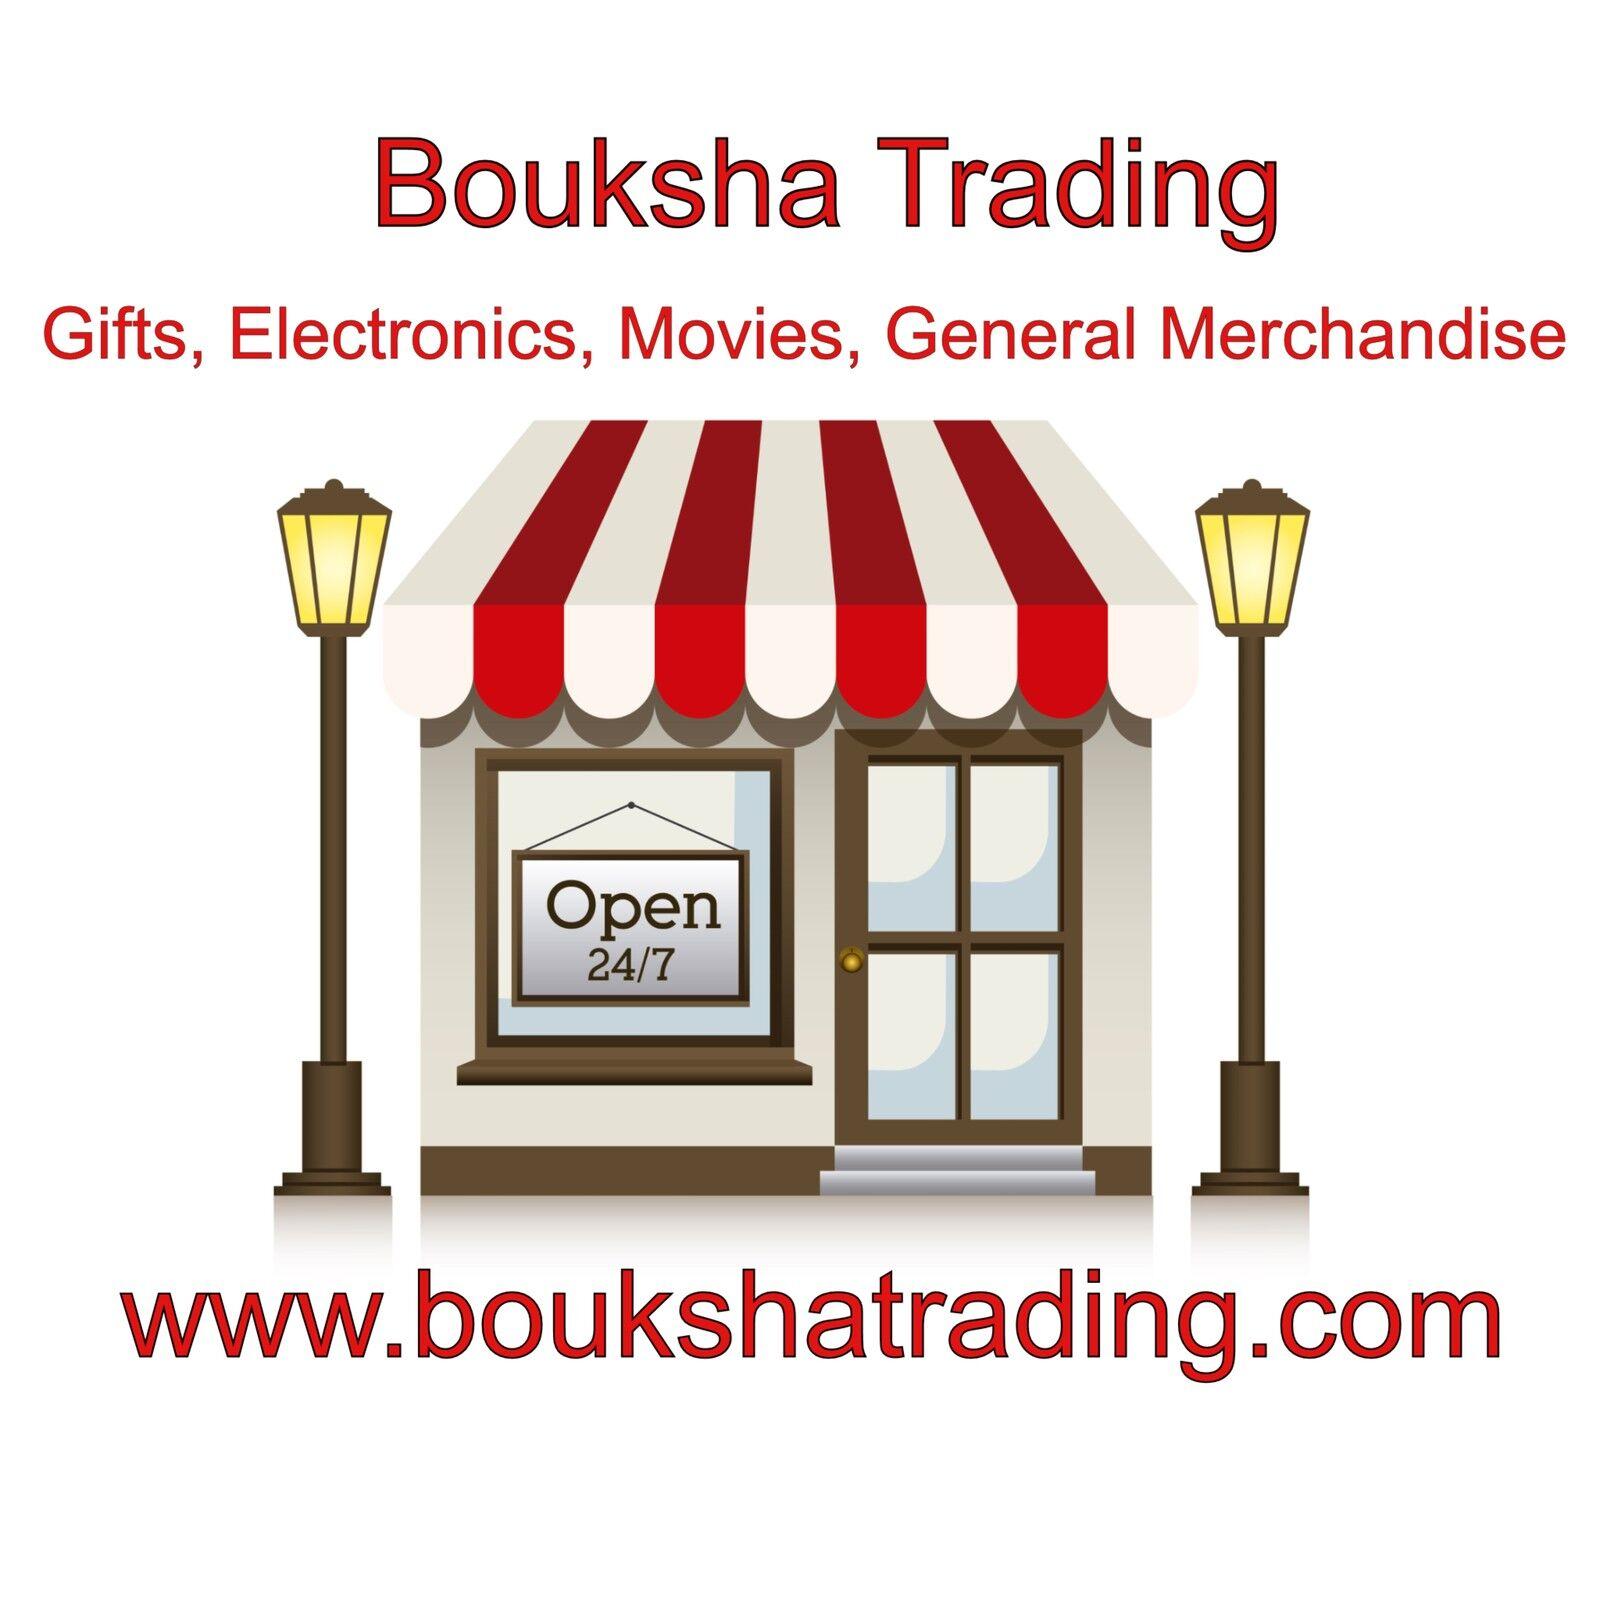 Bouksha Trading